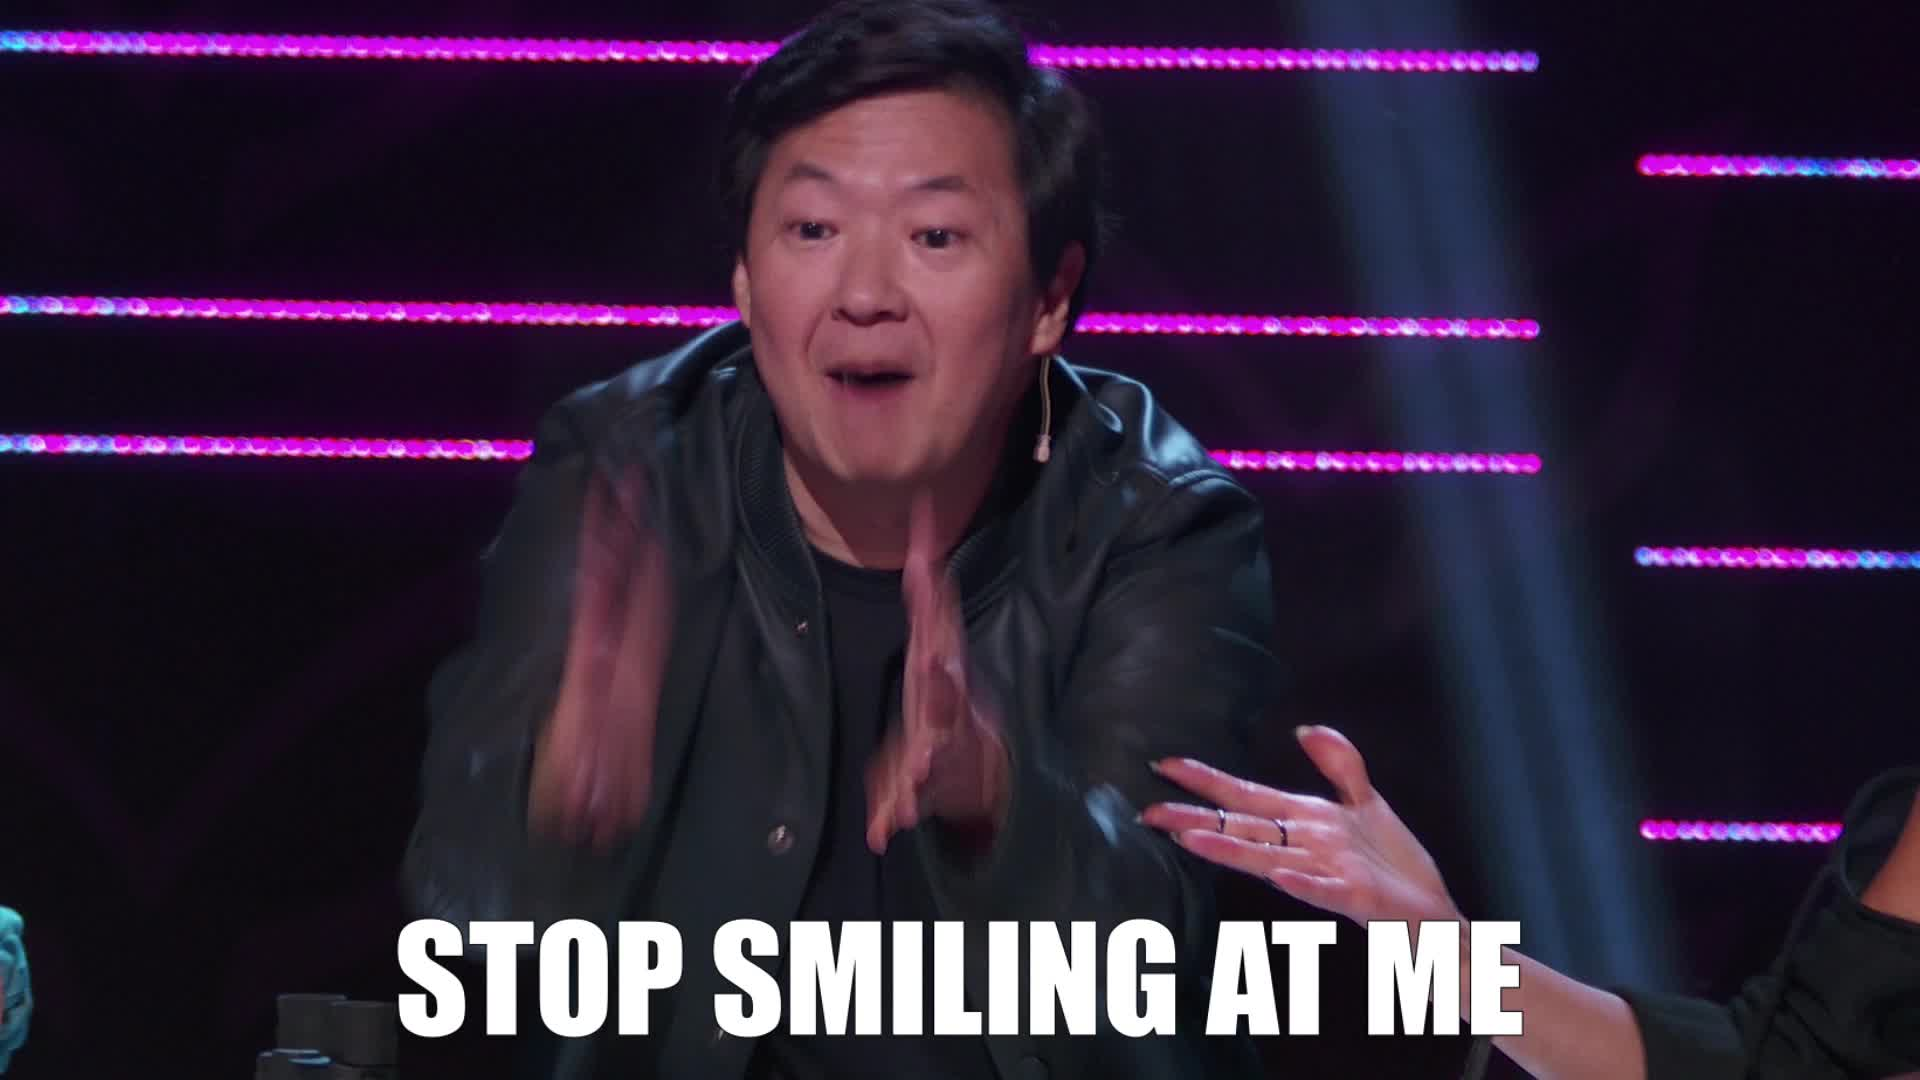 excited, happy, ken jeong, masked singer, smile, stop, the masked singer, the masked singer on fox, Stop Smiling At Me GIFs